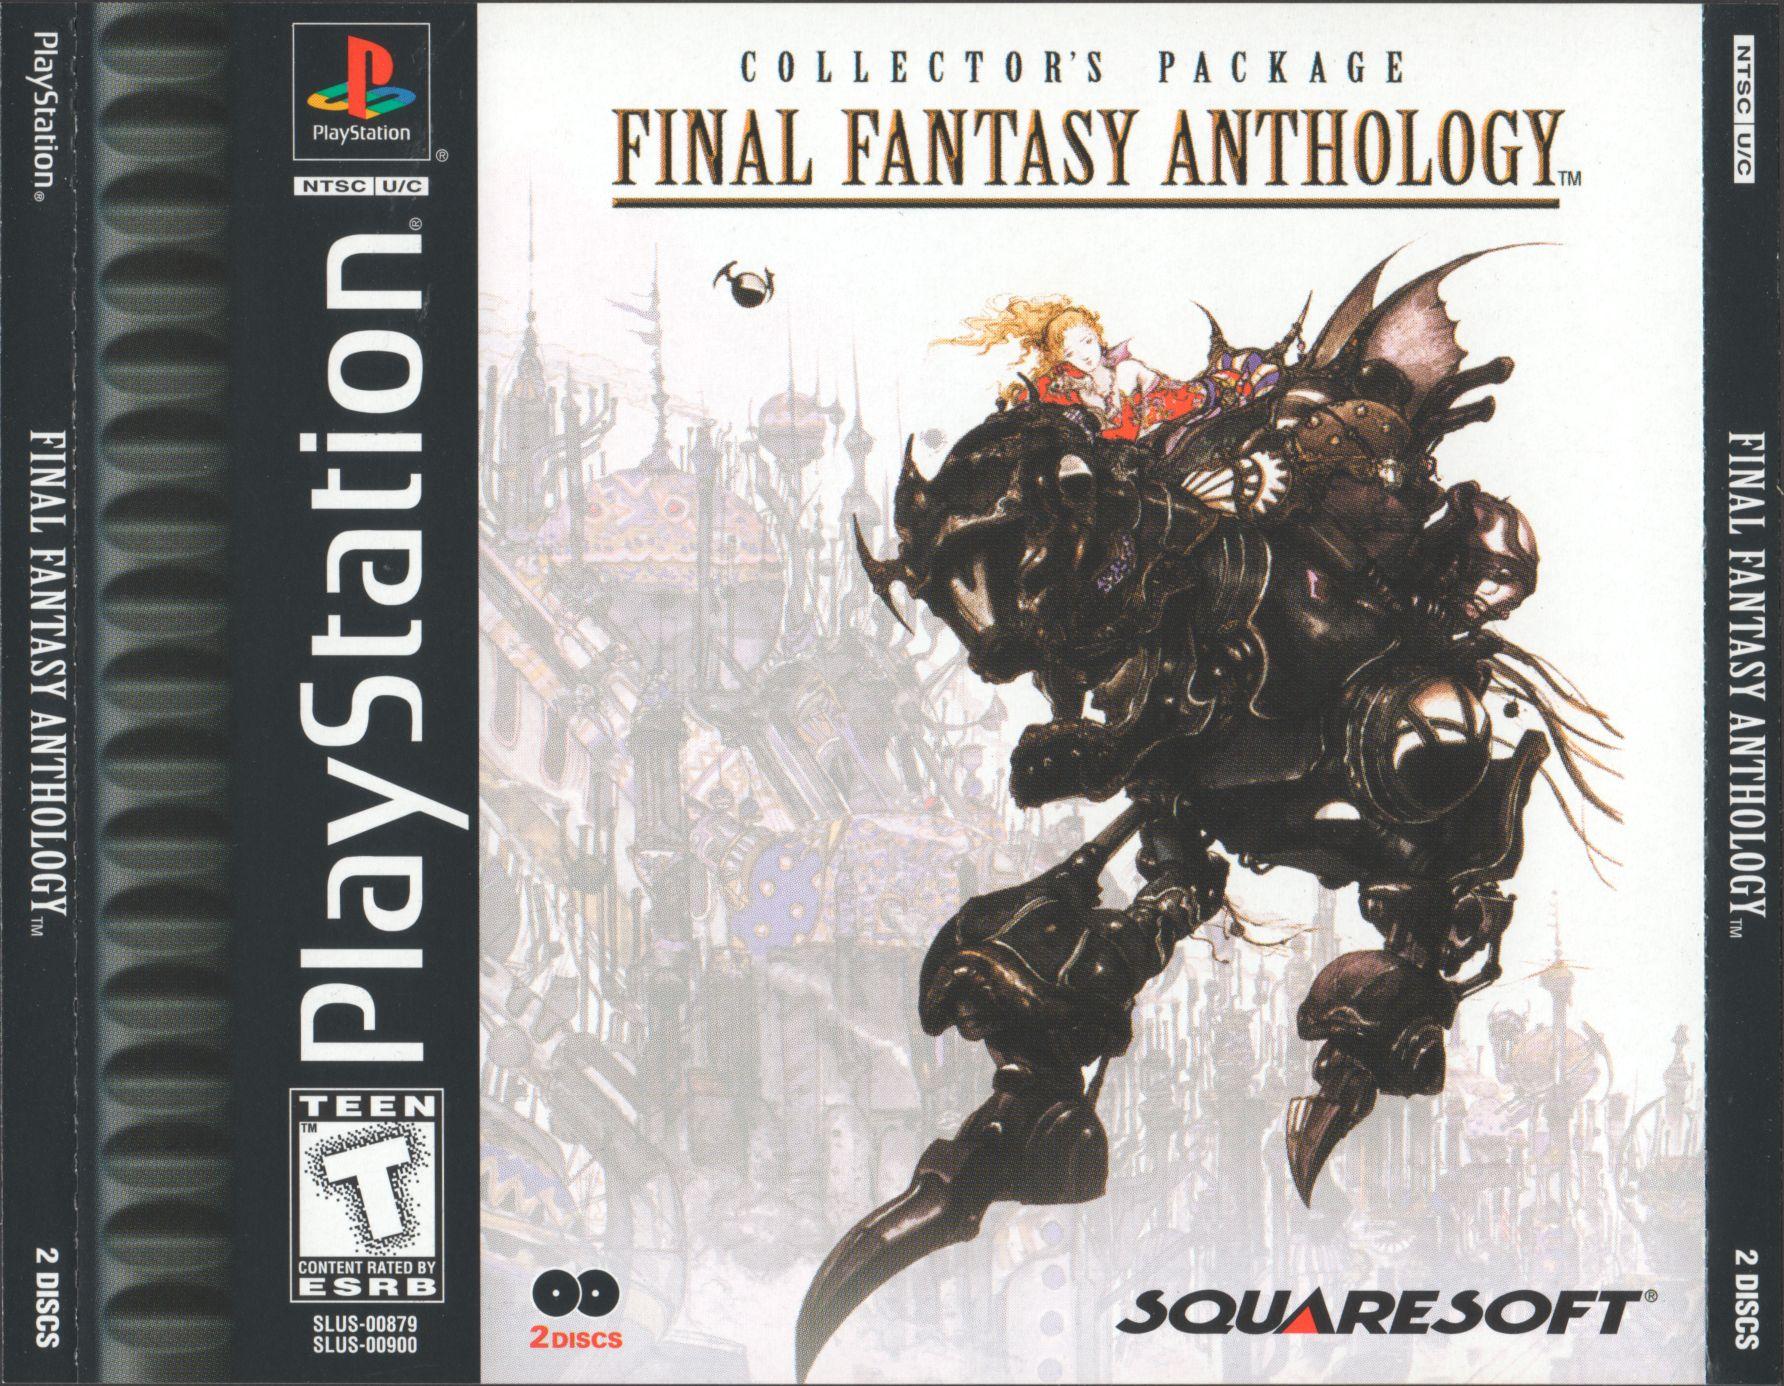 Final Fantasy 6 Rom final fantasy anthology - final fantasy vi [slus-00900] rom